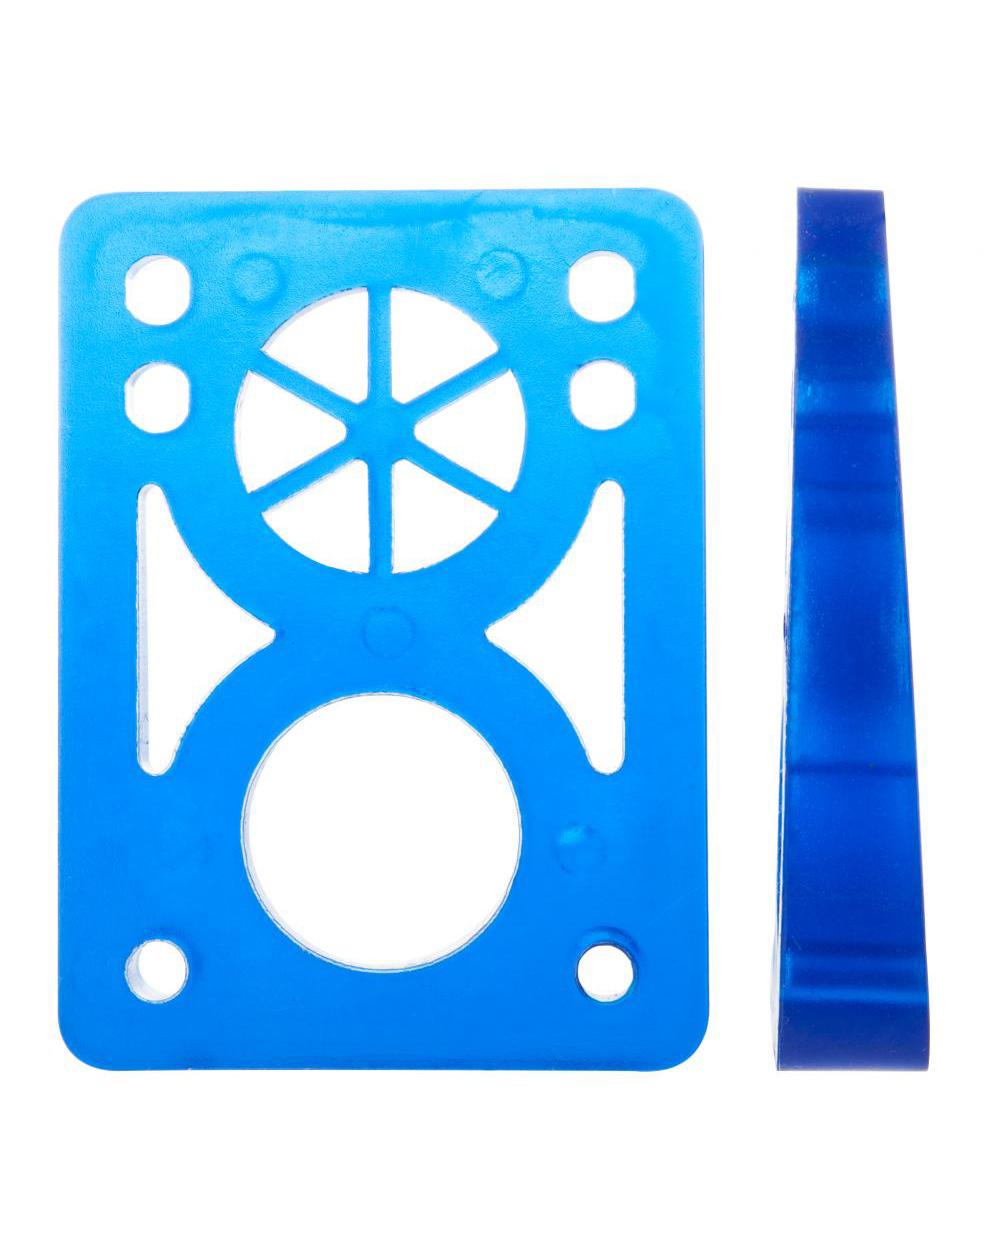 D-Street Soft Wedge 8 to 14 mm Skateboard Baseplates Clear Blue 2 er Pack